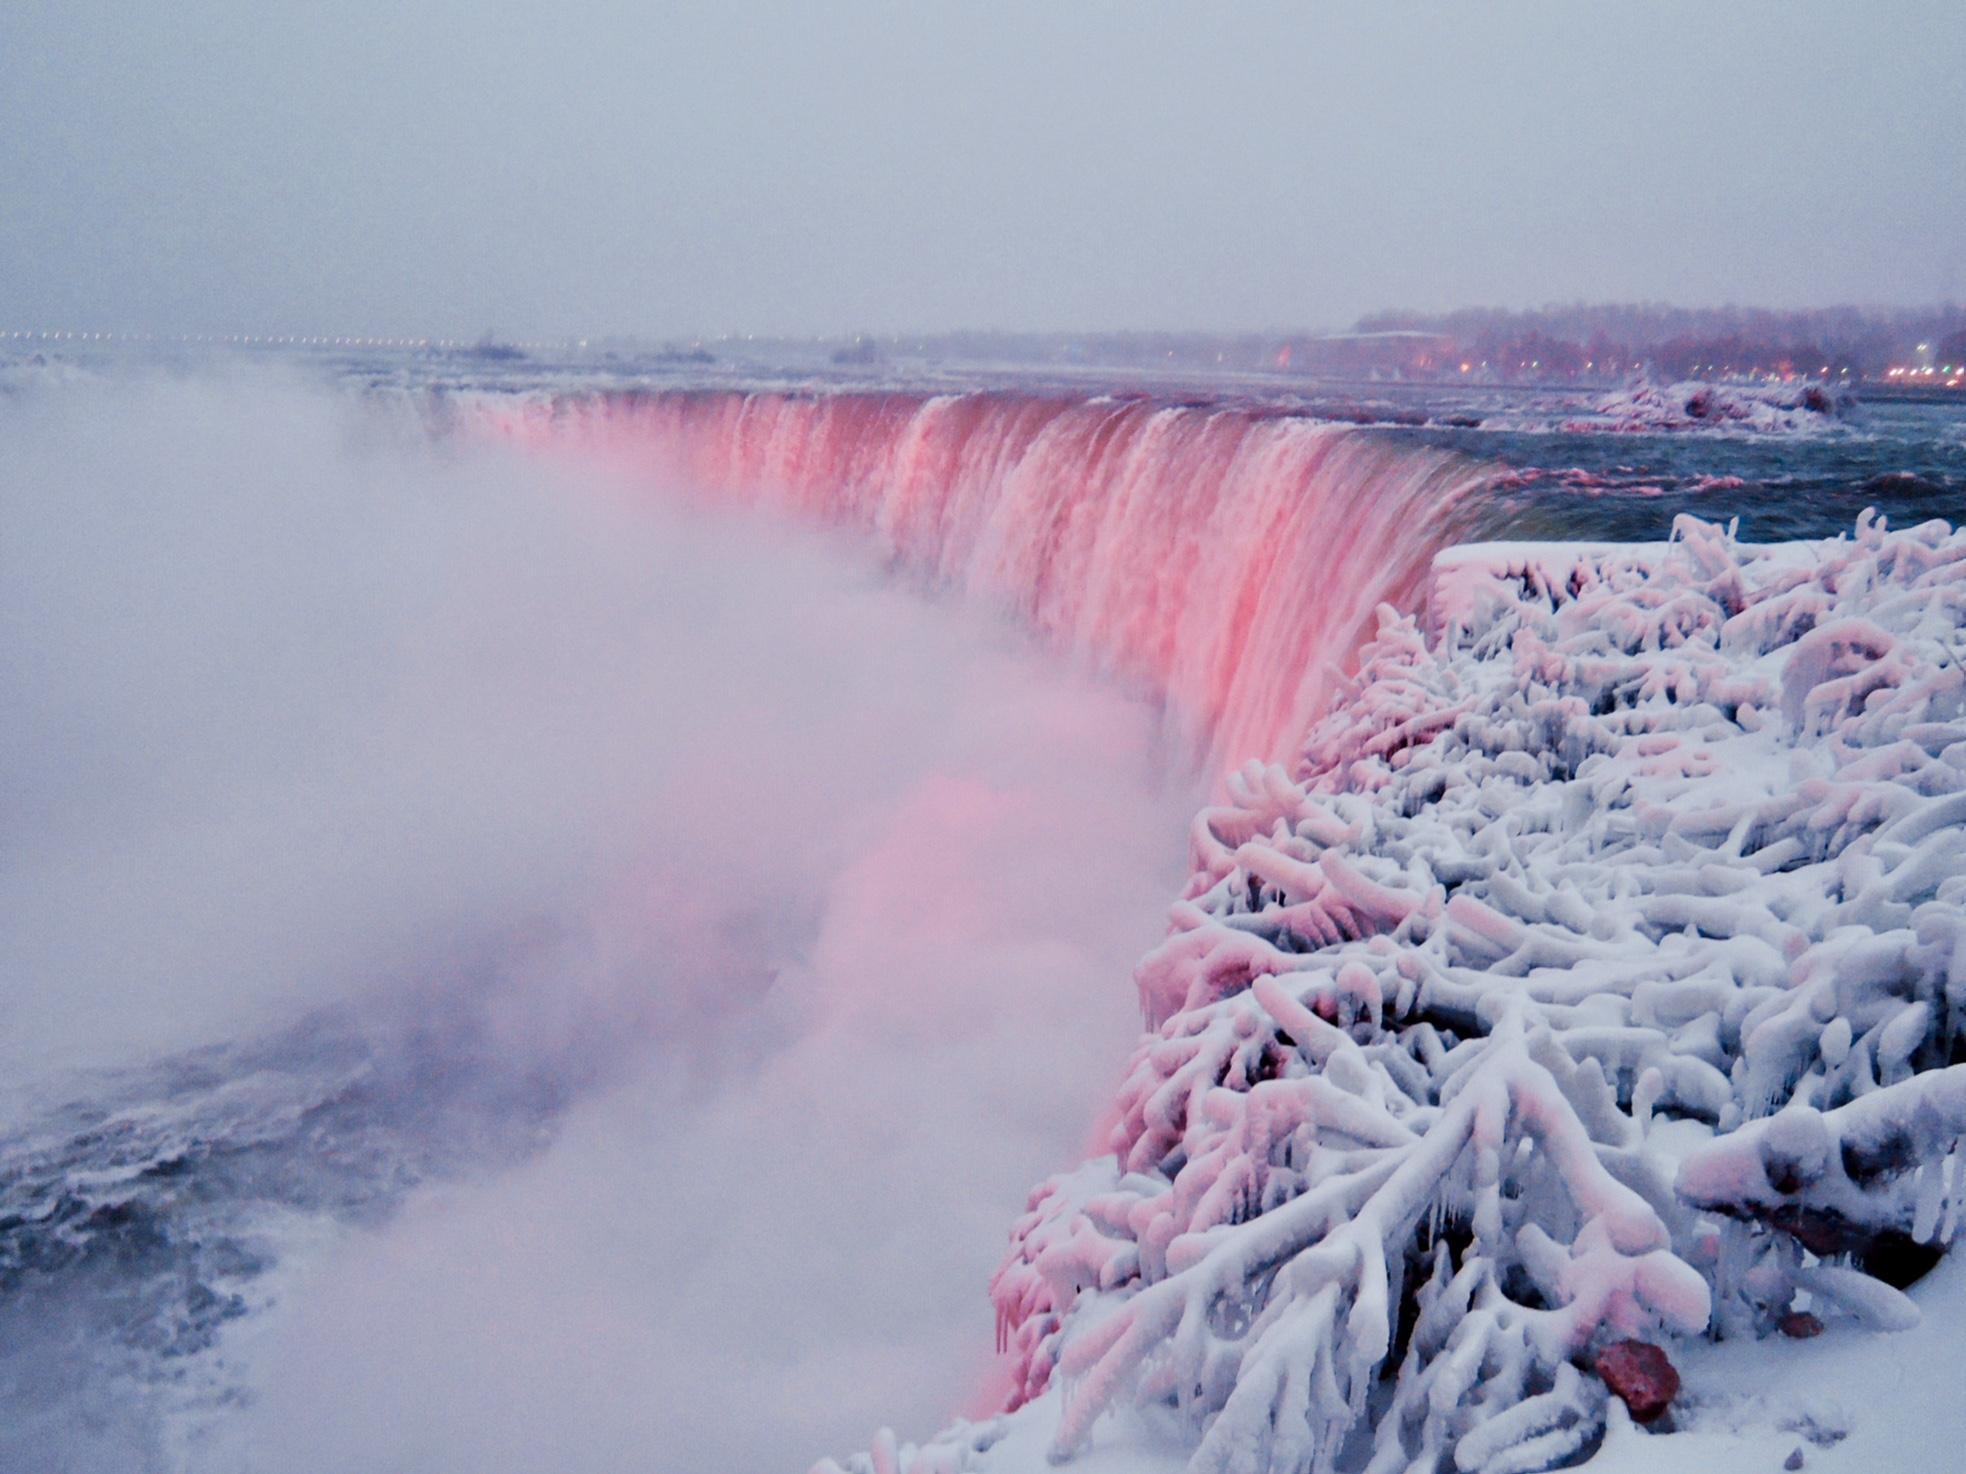 Frozen Beauty Of Niagara Falls What It S Like Up Close